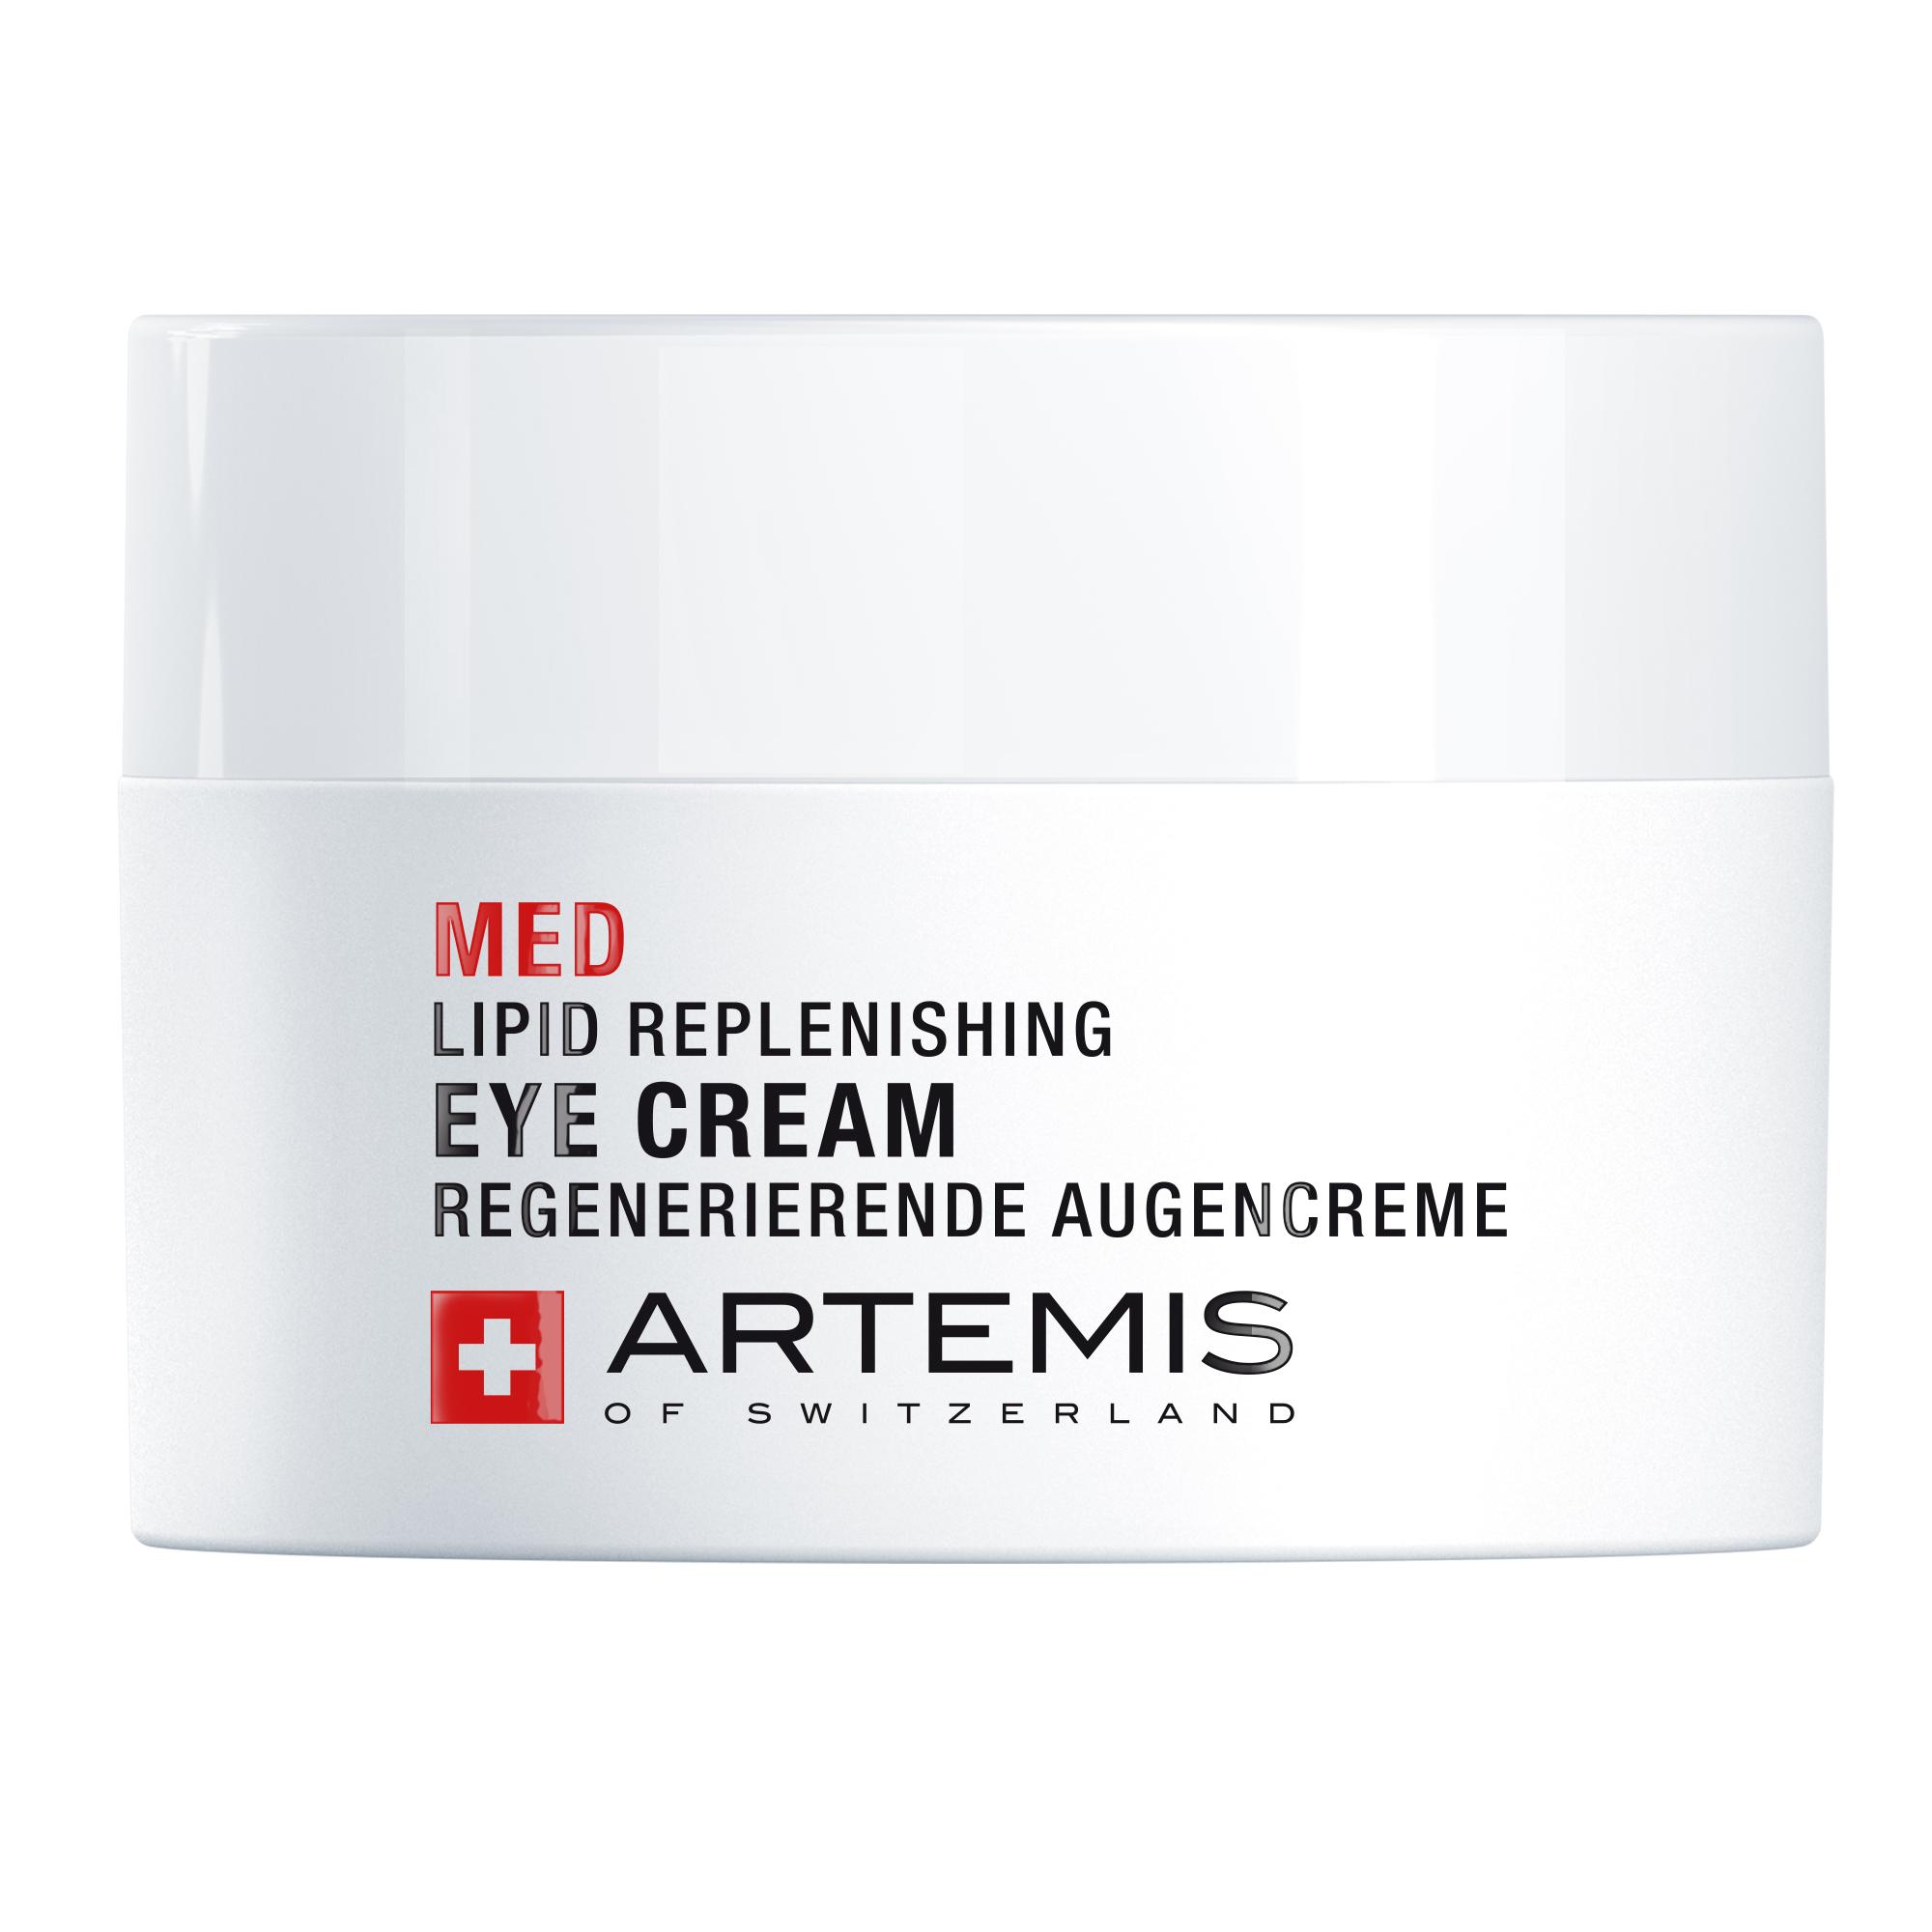 Artemis MED Lipid Replenishing Eye Cream 15ml